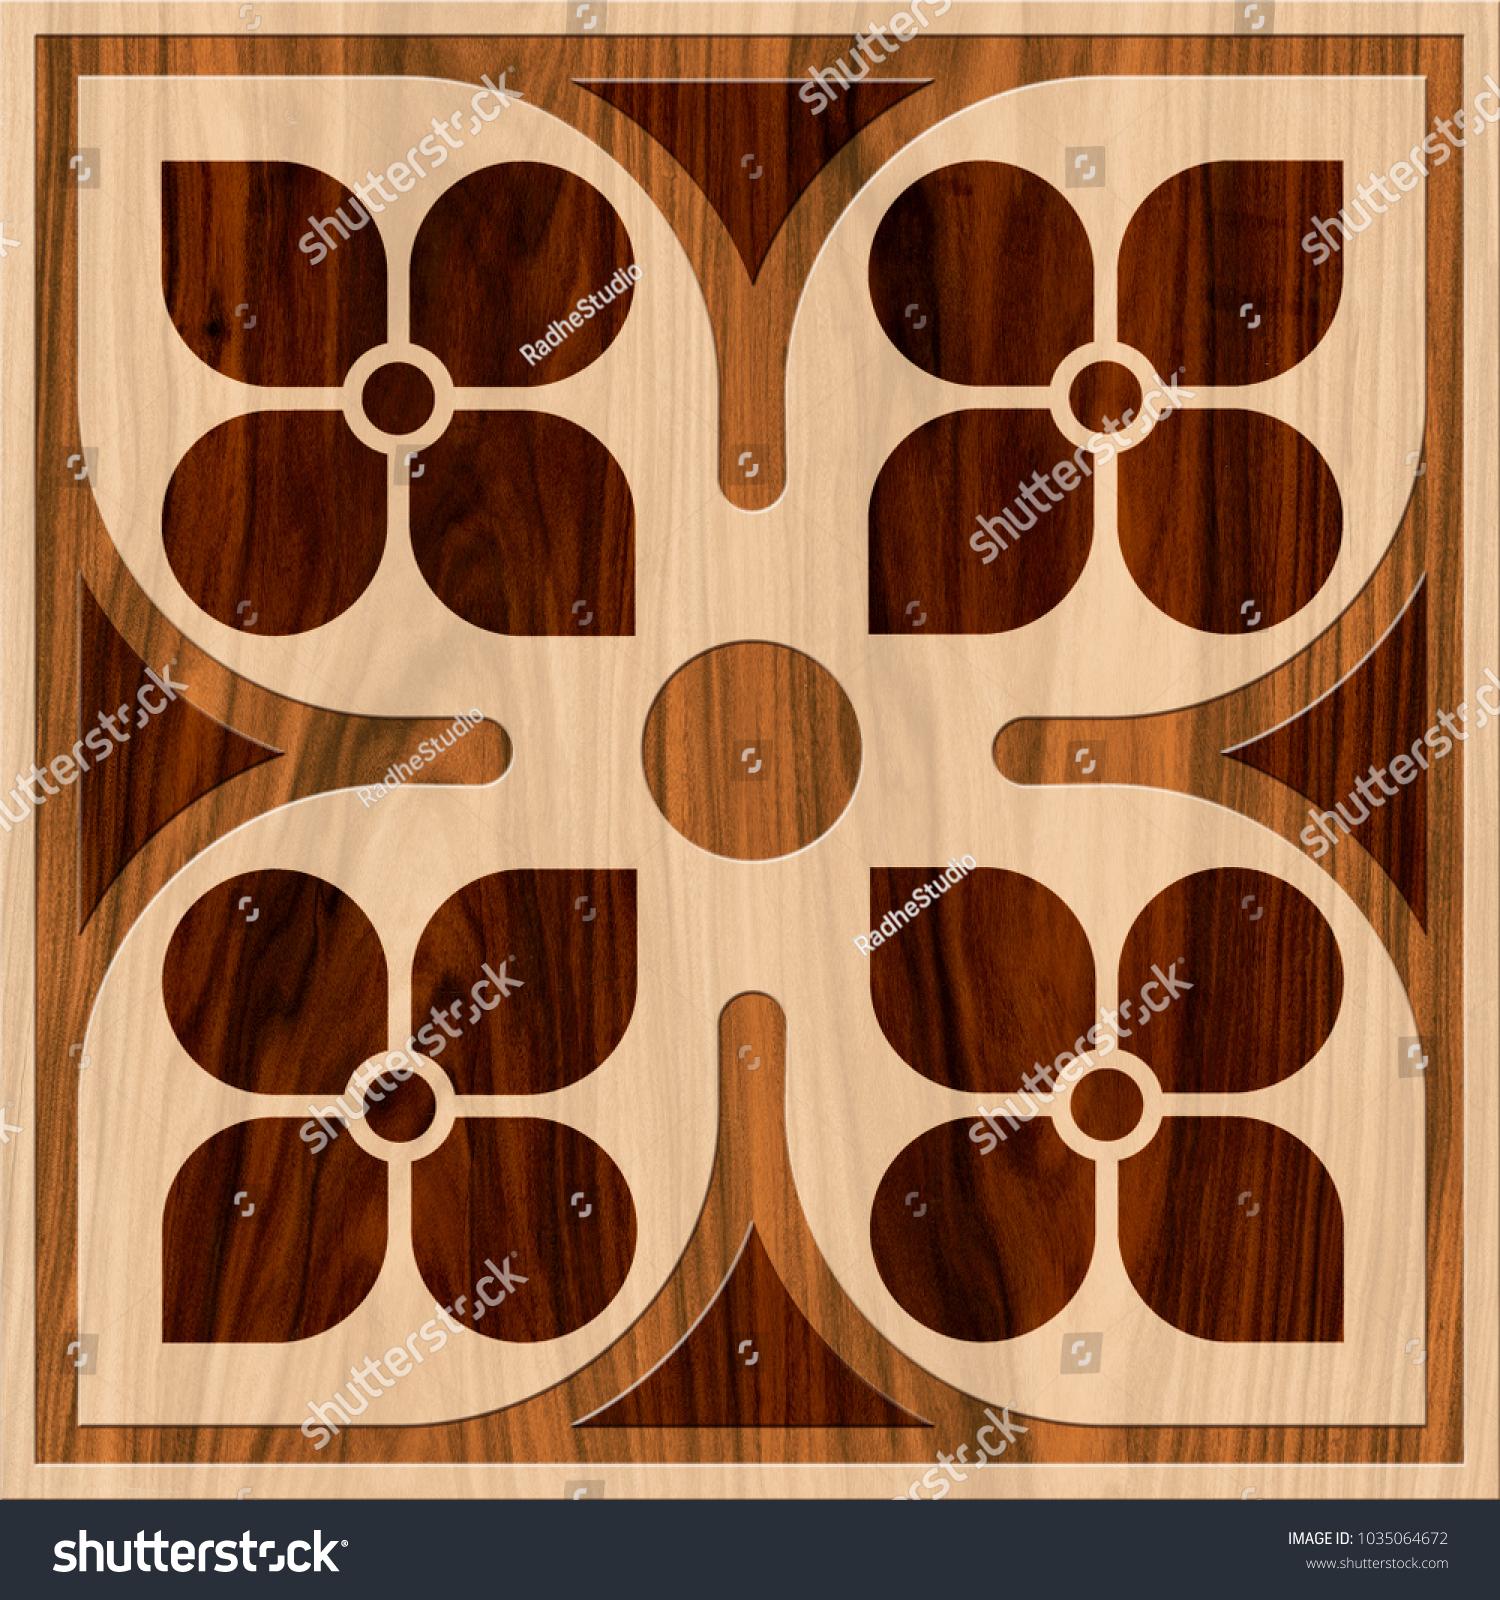 Unusual Decorative Wood Wall Art Ideas - The Wall Art Decorations ...